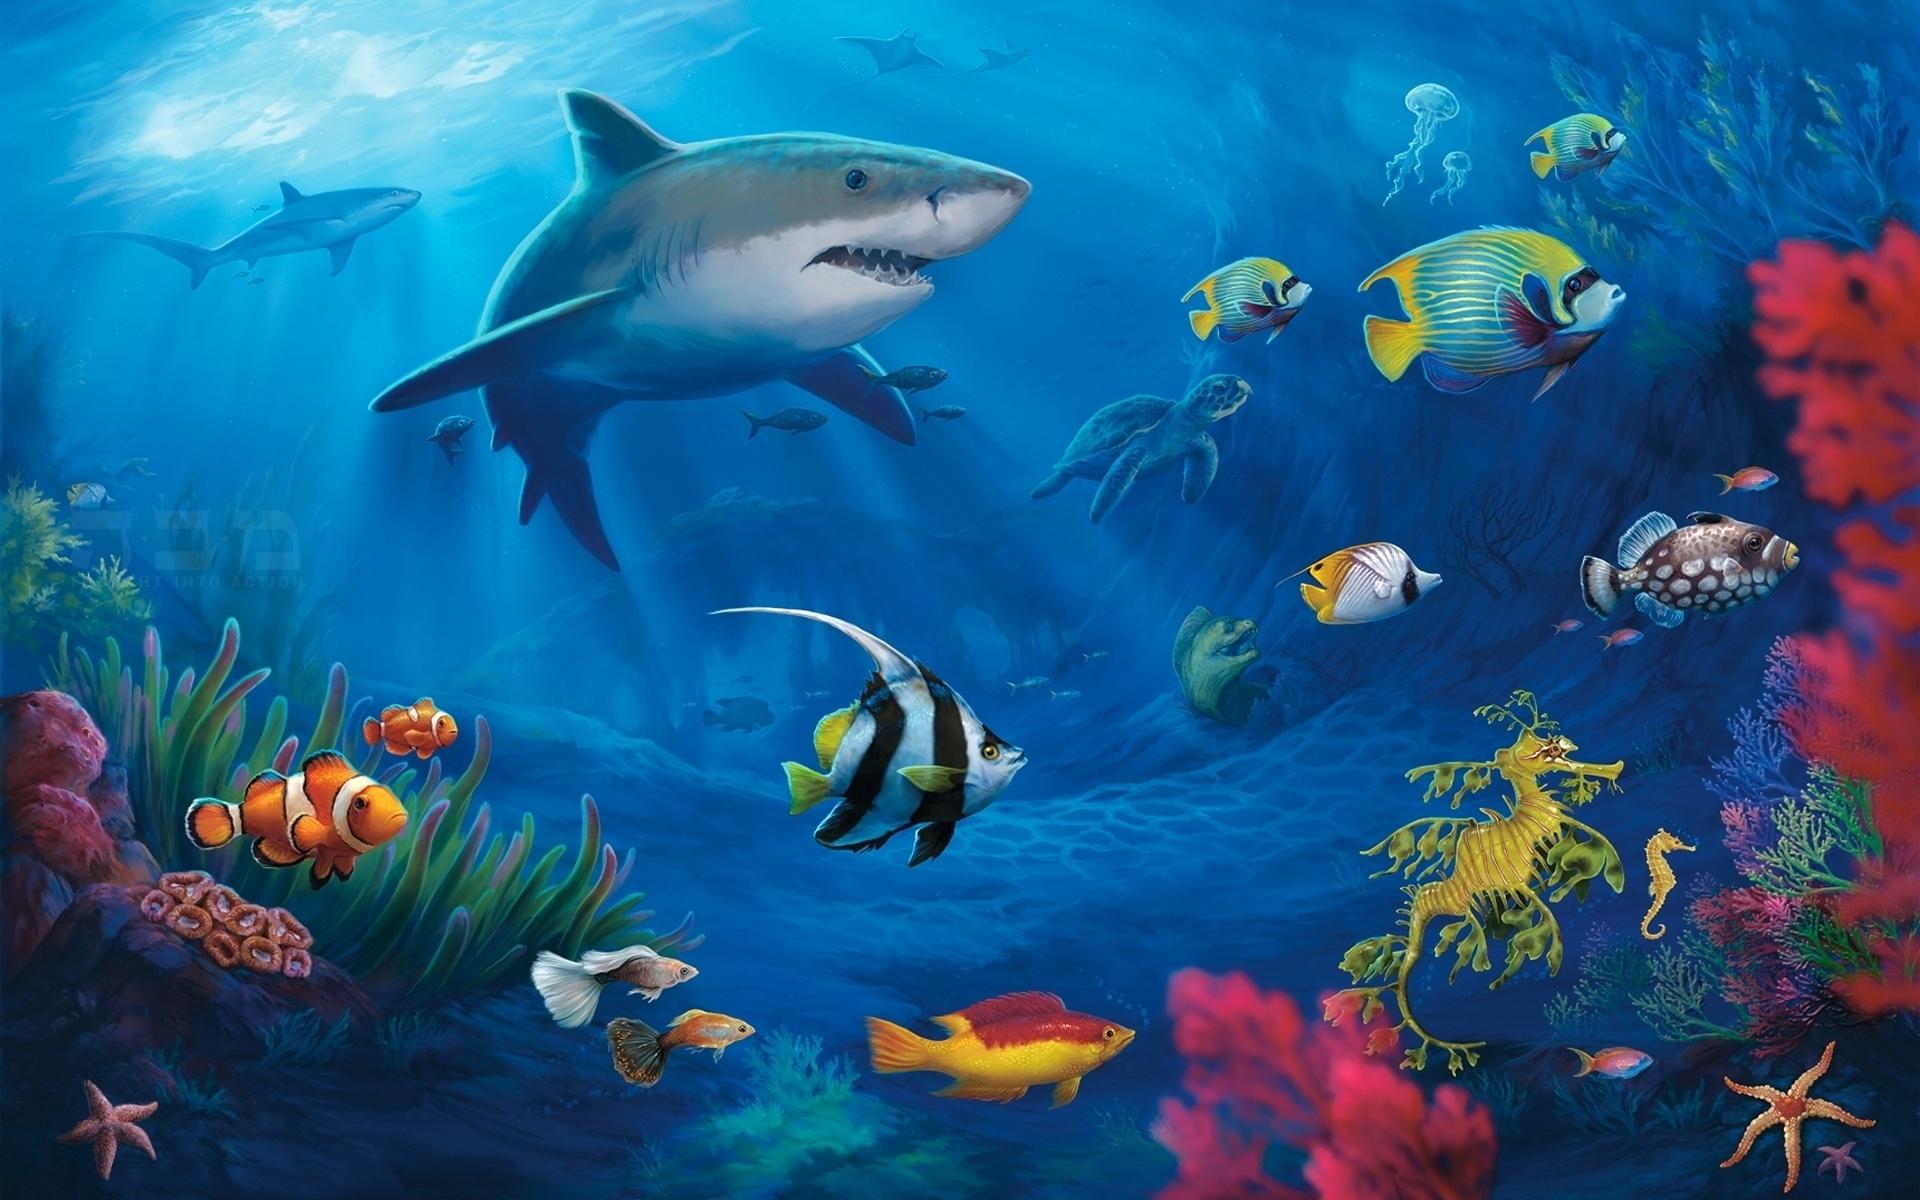 44 ] Undersea Wallpaper On WallpaperSafari